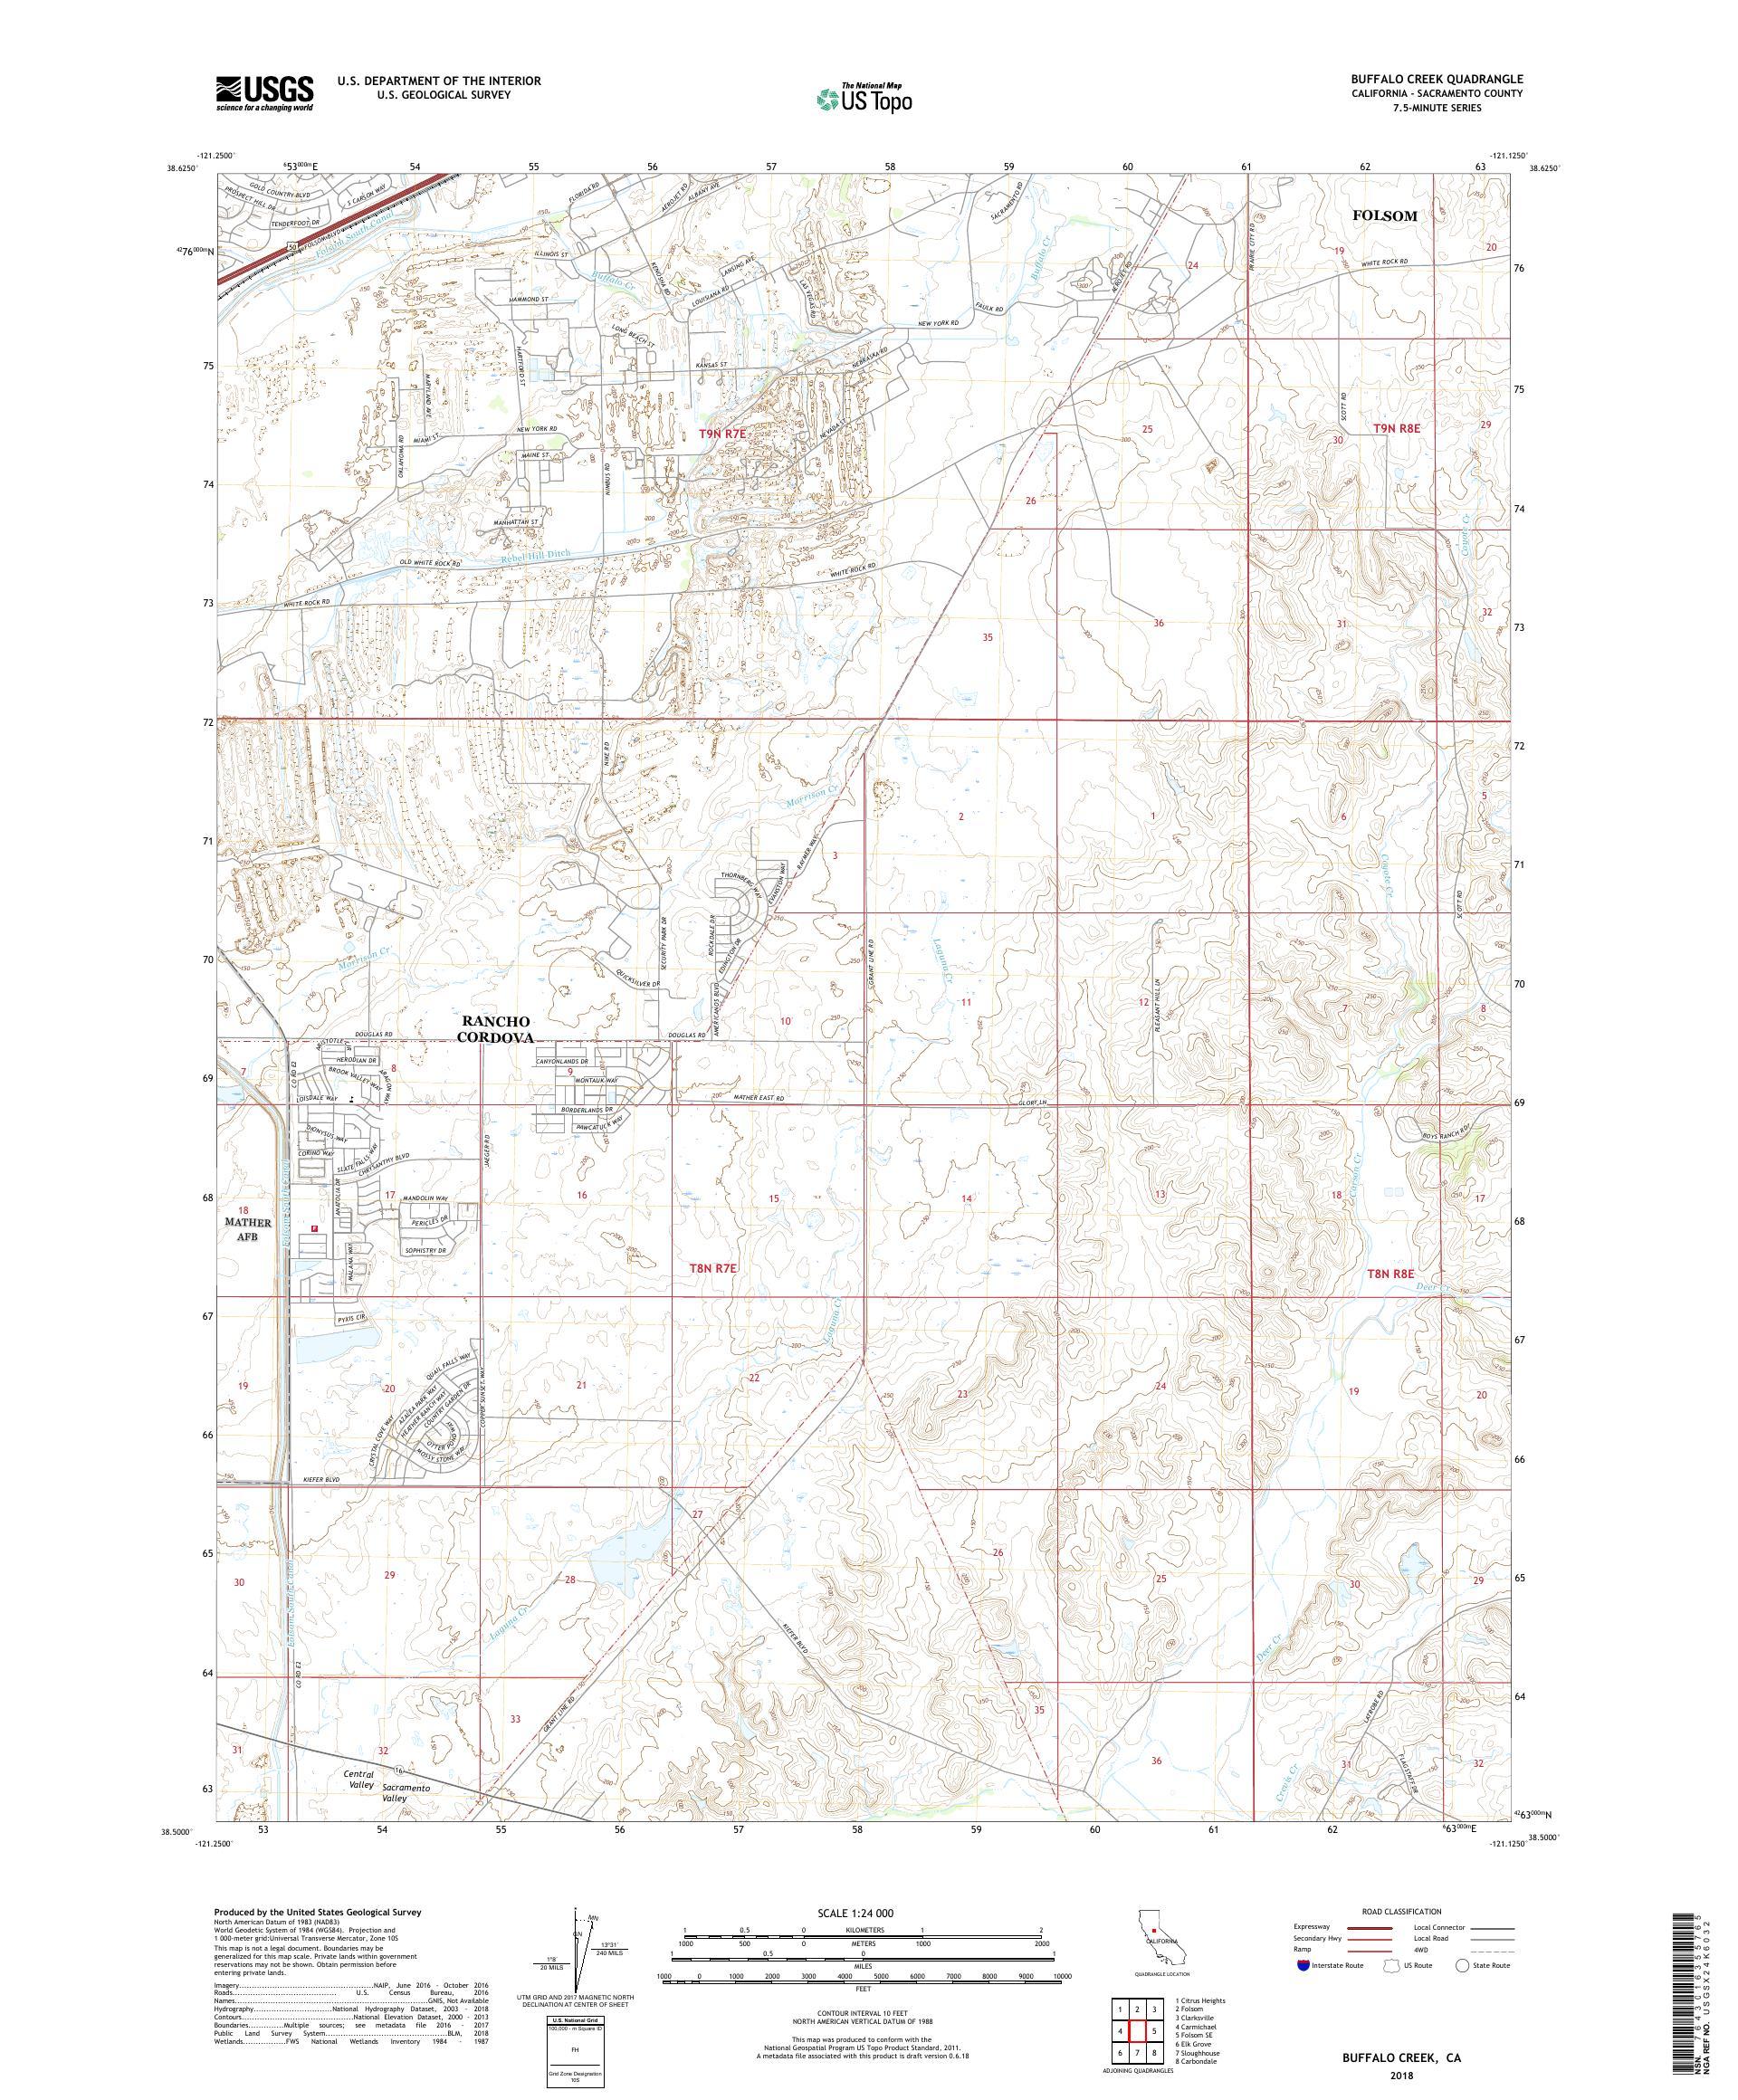 MyTopo Buffalo Creek, California USGS Quad Topo Map on us map new york, us map missouri, us map texas, us map ga, us map kansas, us map mn, us map ny, us map ohio, us map md,